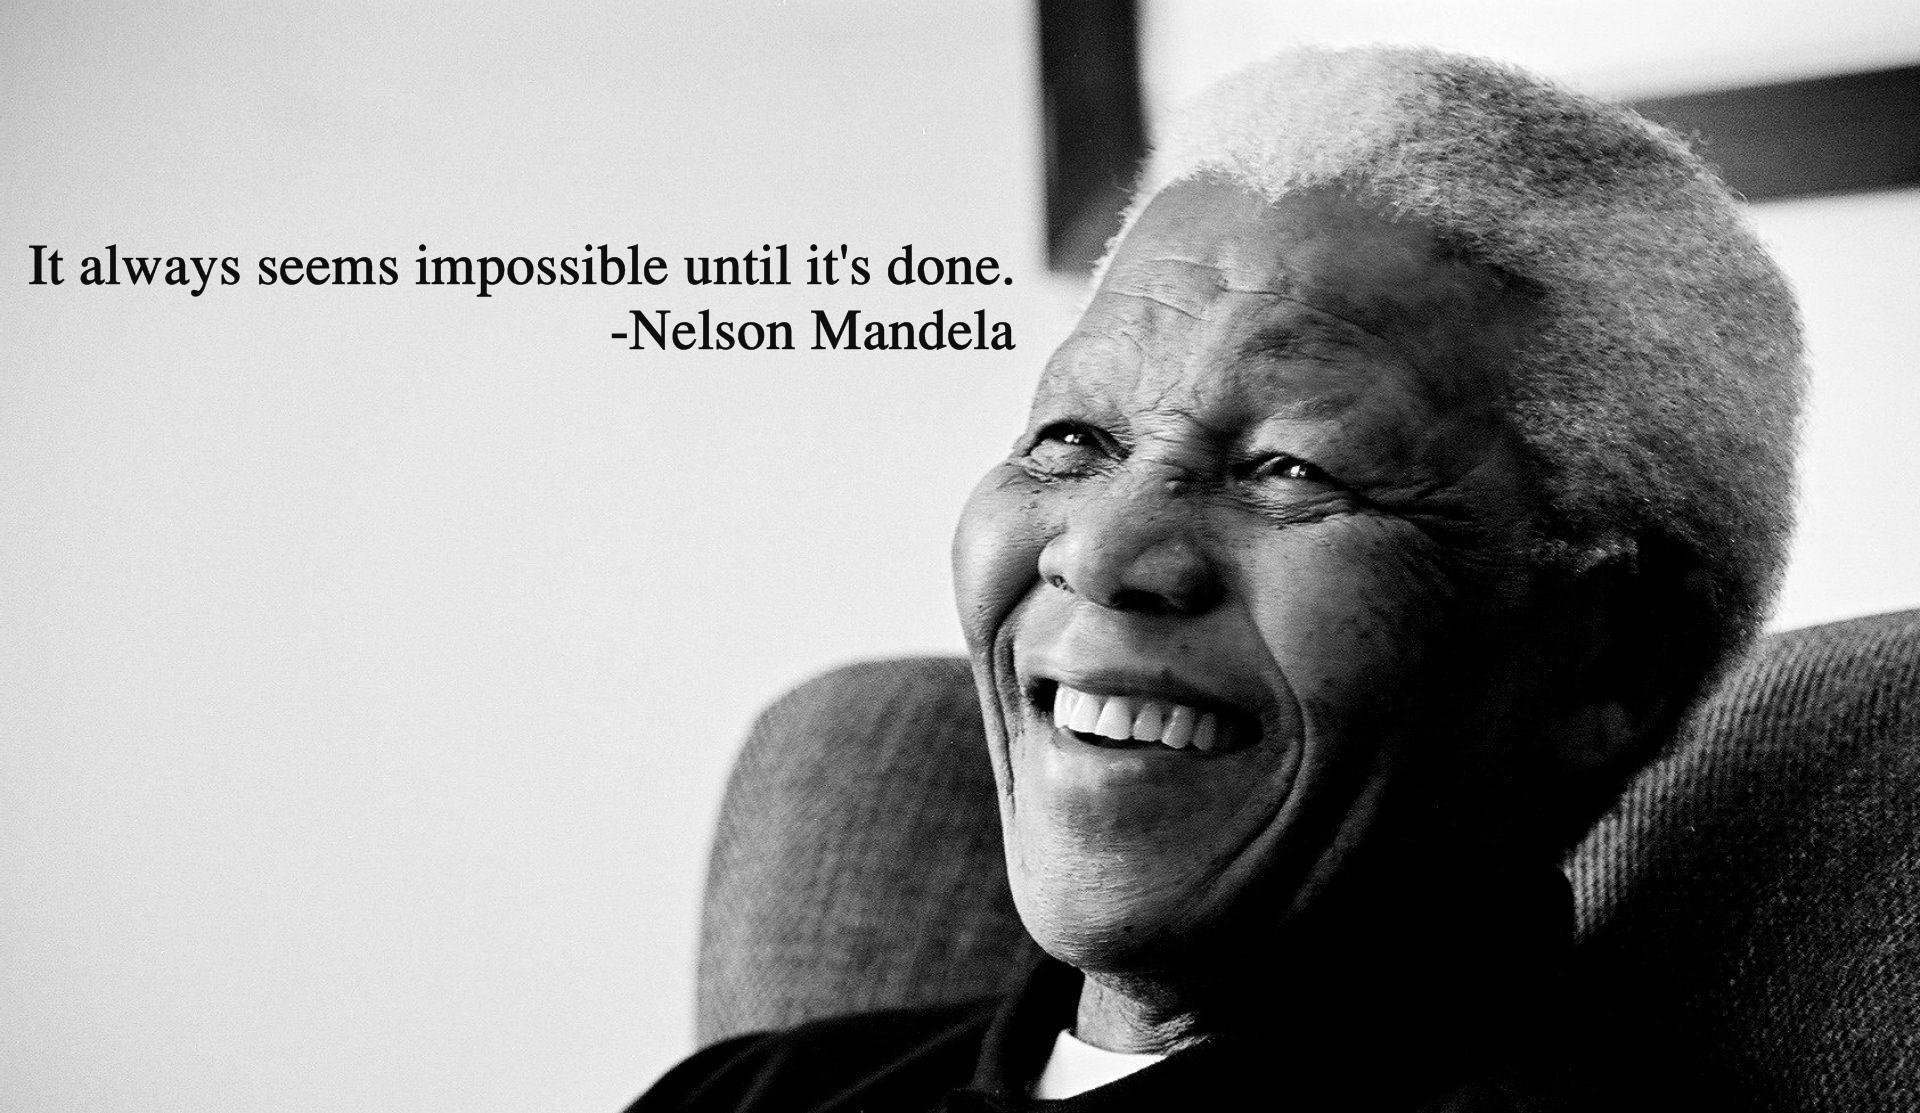 nelson-mandela-motivational-quote